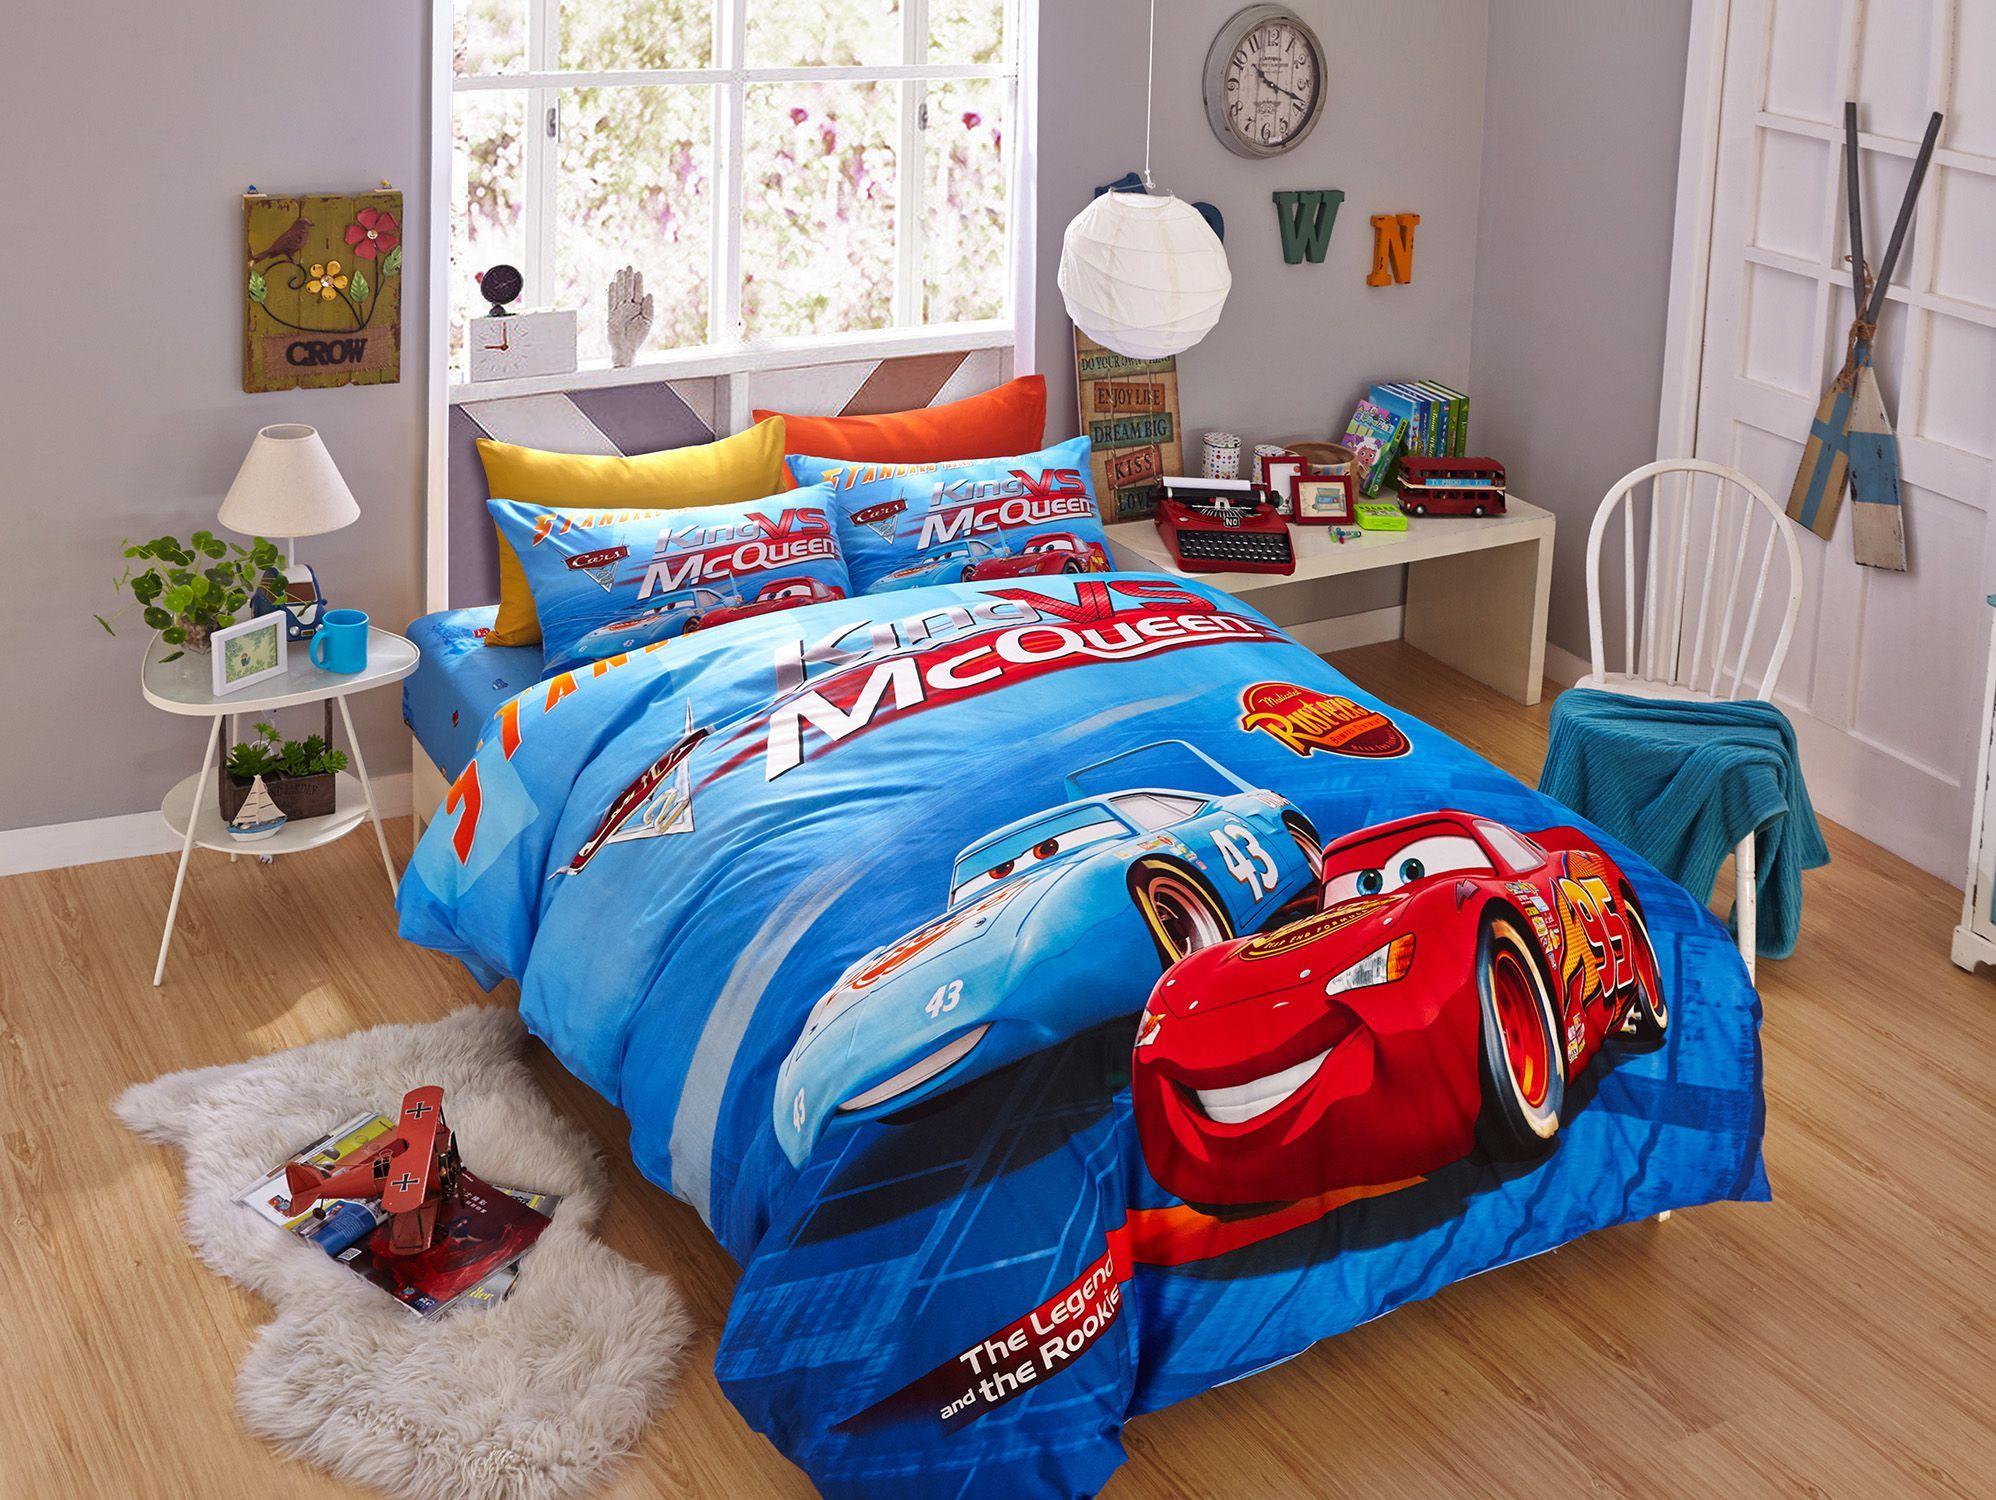 Blue Color Disney Cars Bedding Set Saetta mcqueen